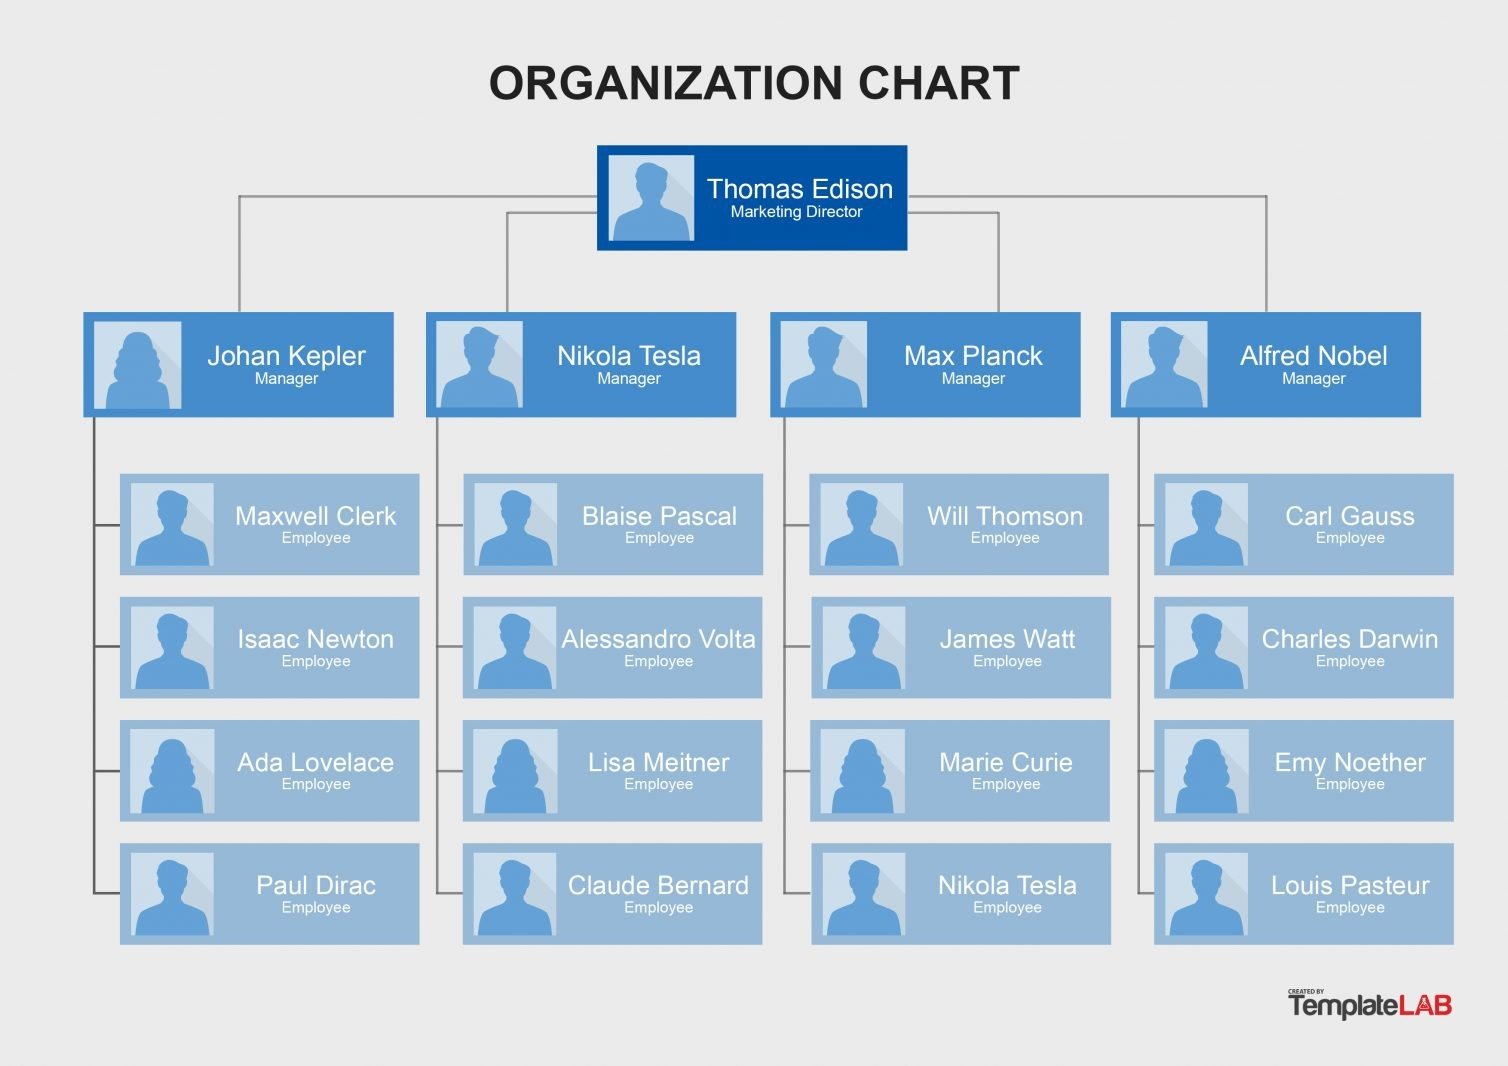 41 Organizational Chart Templates Word Excel Powerpoint Psd